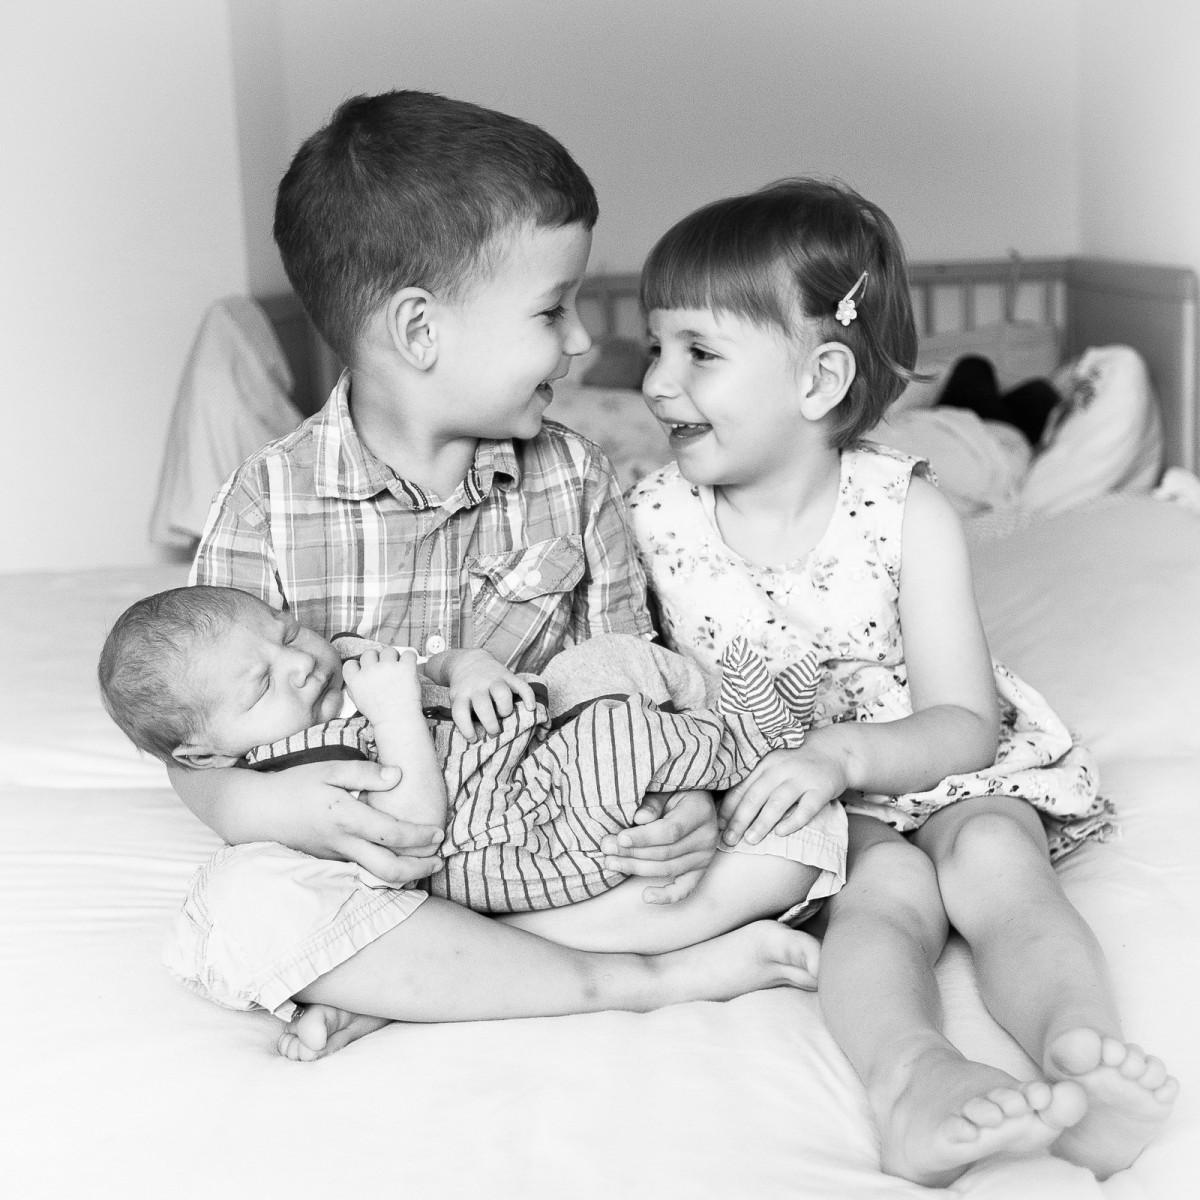 Babyfotos, Babyfotografie, Neugeborene, Neugeborenenfotos, Neugeborenen Fotografie, Babies, Babys, Geburtsfotos, Geburtsfotografie, liebevolle Babyfotografie, liebevolle Neugeborenfotografie, Homstory Baby, liebevolle Neugeborenenfotos, liebevolle Neugeborenenfotografie, entspannte Babyfotos, entspannte Neugeborenenfotografie, wundervolle Babyfotos, wundervolle Babyfotografie, wundervolle Neugeborenenfotos, wundervolle Neugeborenenfotografie, Weinstadt, Babyfotos Weinstadt, Babyfotografie Weinstadt, Neugeborenenfotografie Weinstadt, Neugeborenenfotos Weinstadt, liebevolle Babyfotos Weinstadt, Rems-Murr-Kreis, Babyfotos Rems-Murr-Kreis, Neugeborenenfotos Rems-Murr-Kreis, Neugeborenenfotografie Rems-Murr-Kreis, Schorndorf, Waiblingen, Fellbach, Kernen, Welzheim, Backnang, Stuttgart